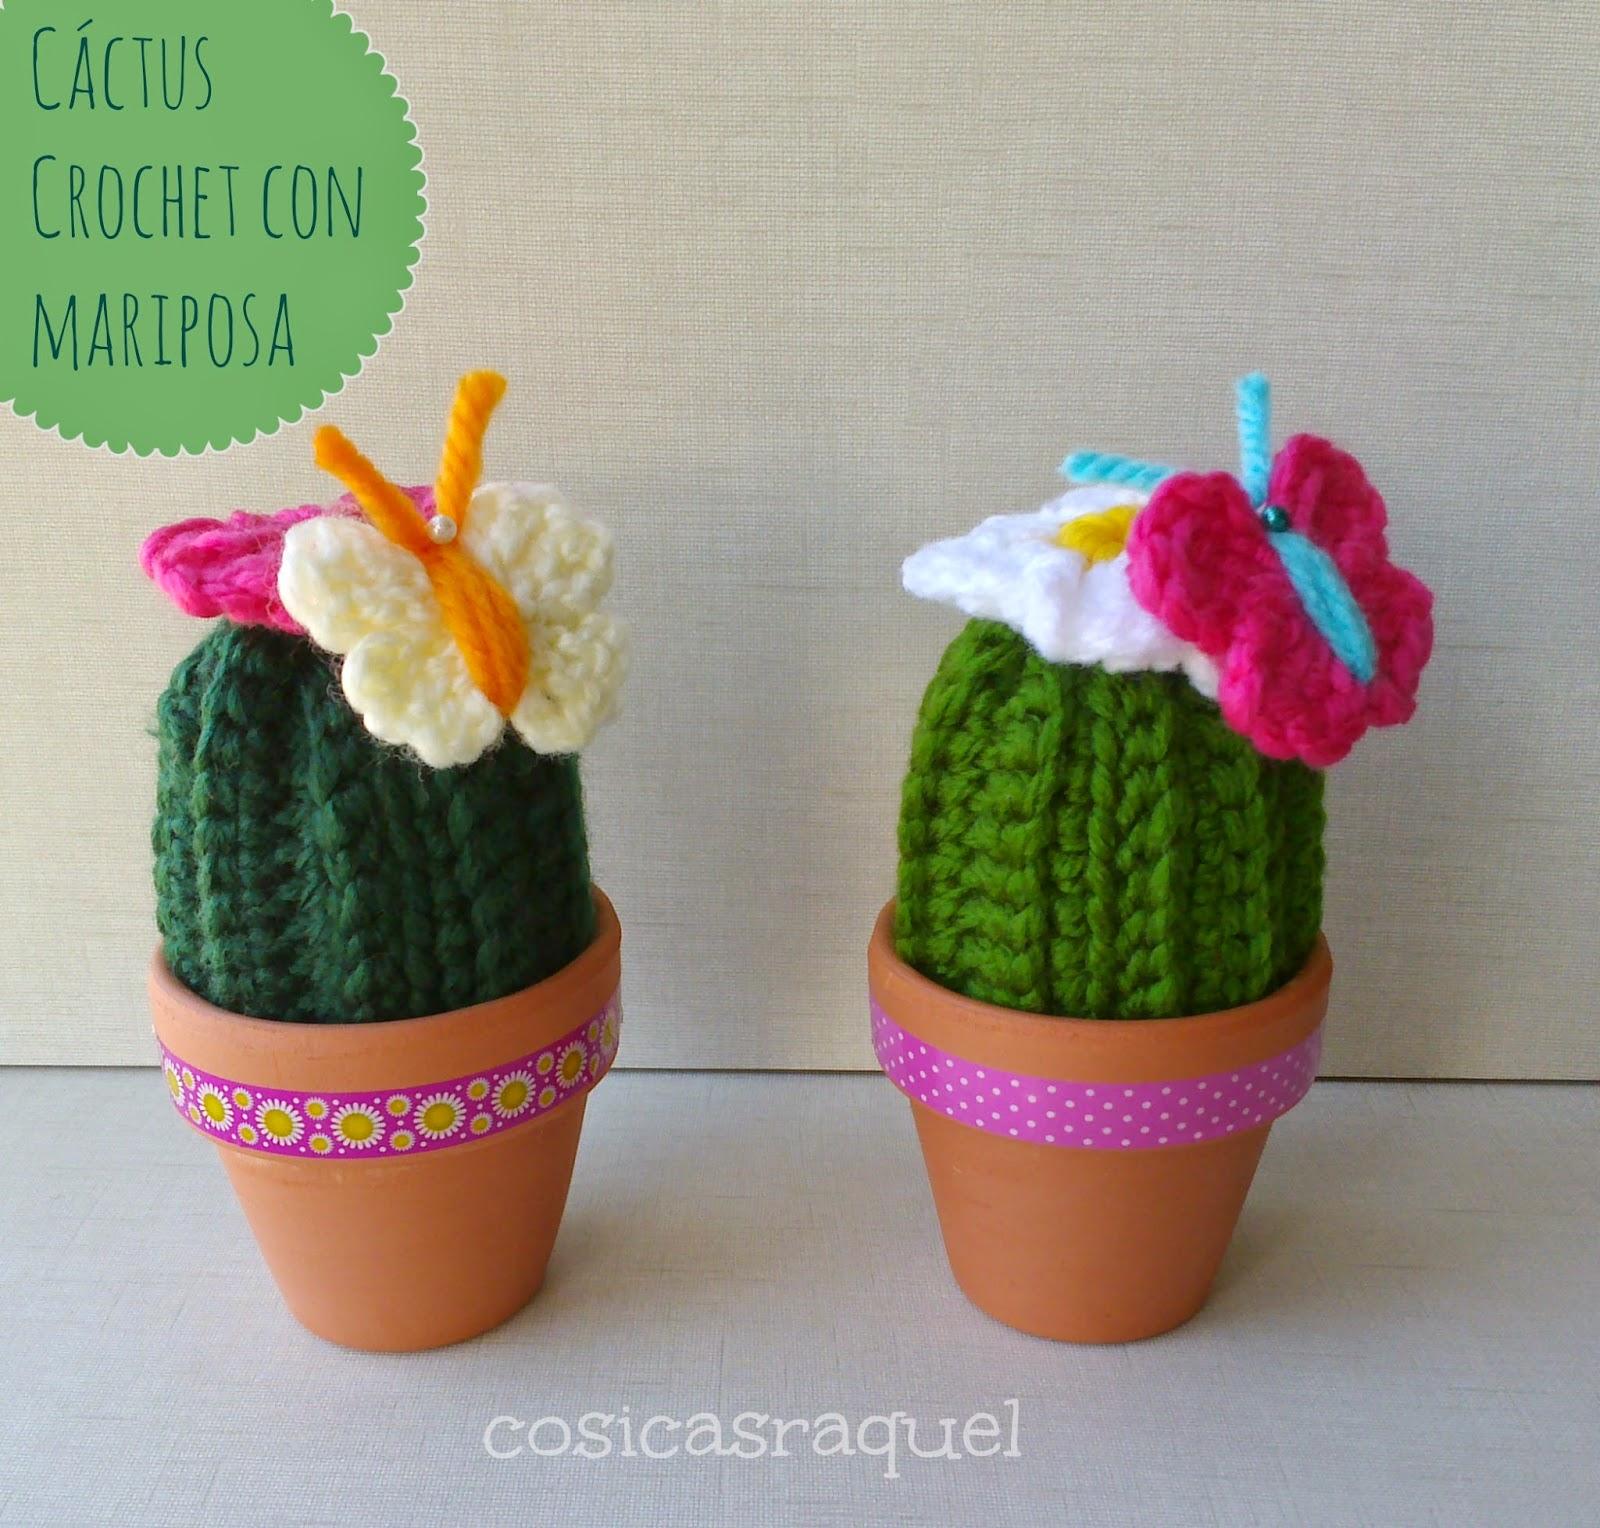 Pasos de como hacer cactus de ganchillo en 4 modelos | Cactus de ... | 1528x1600